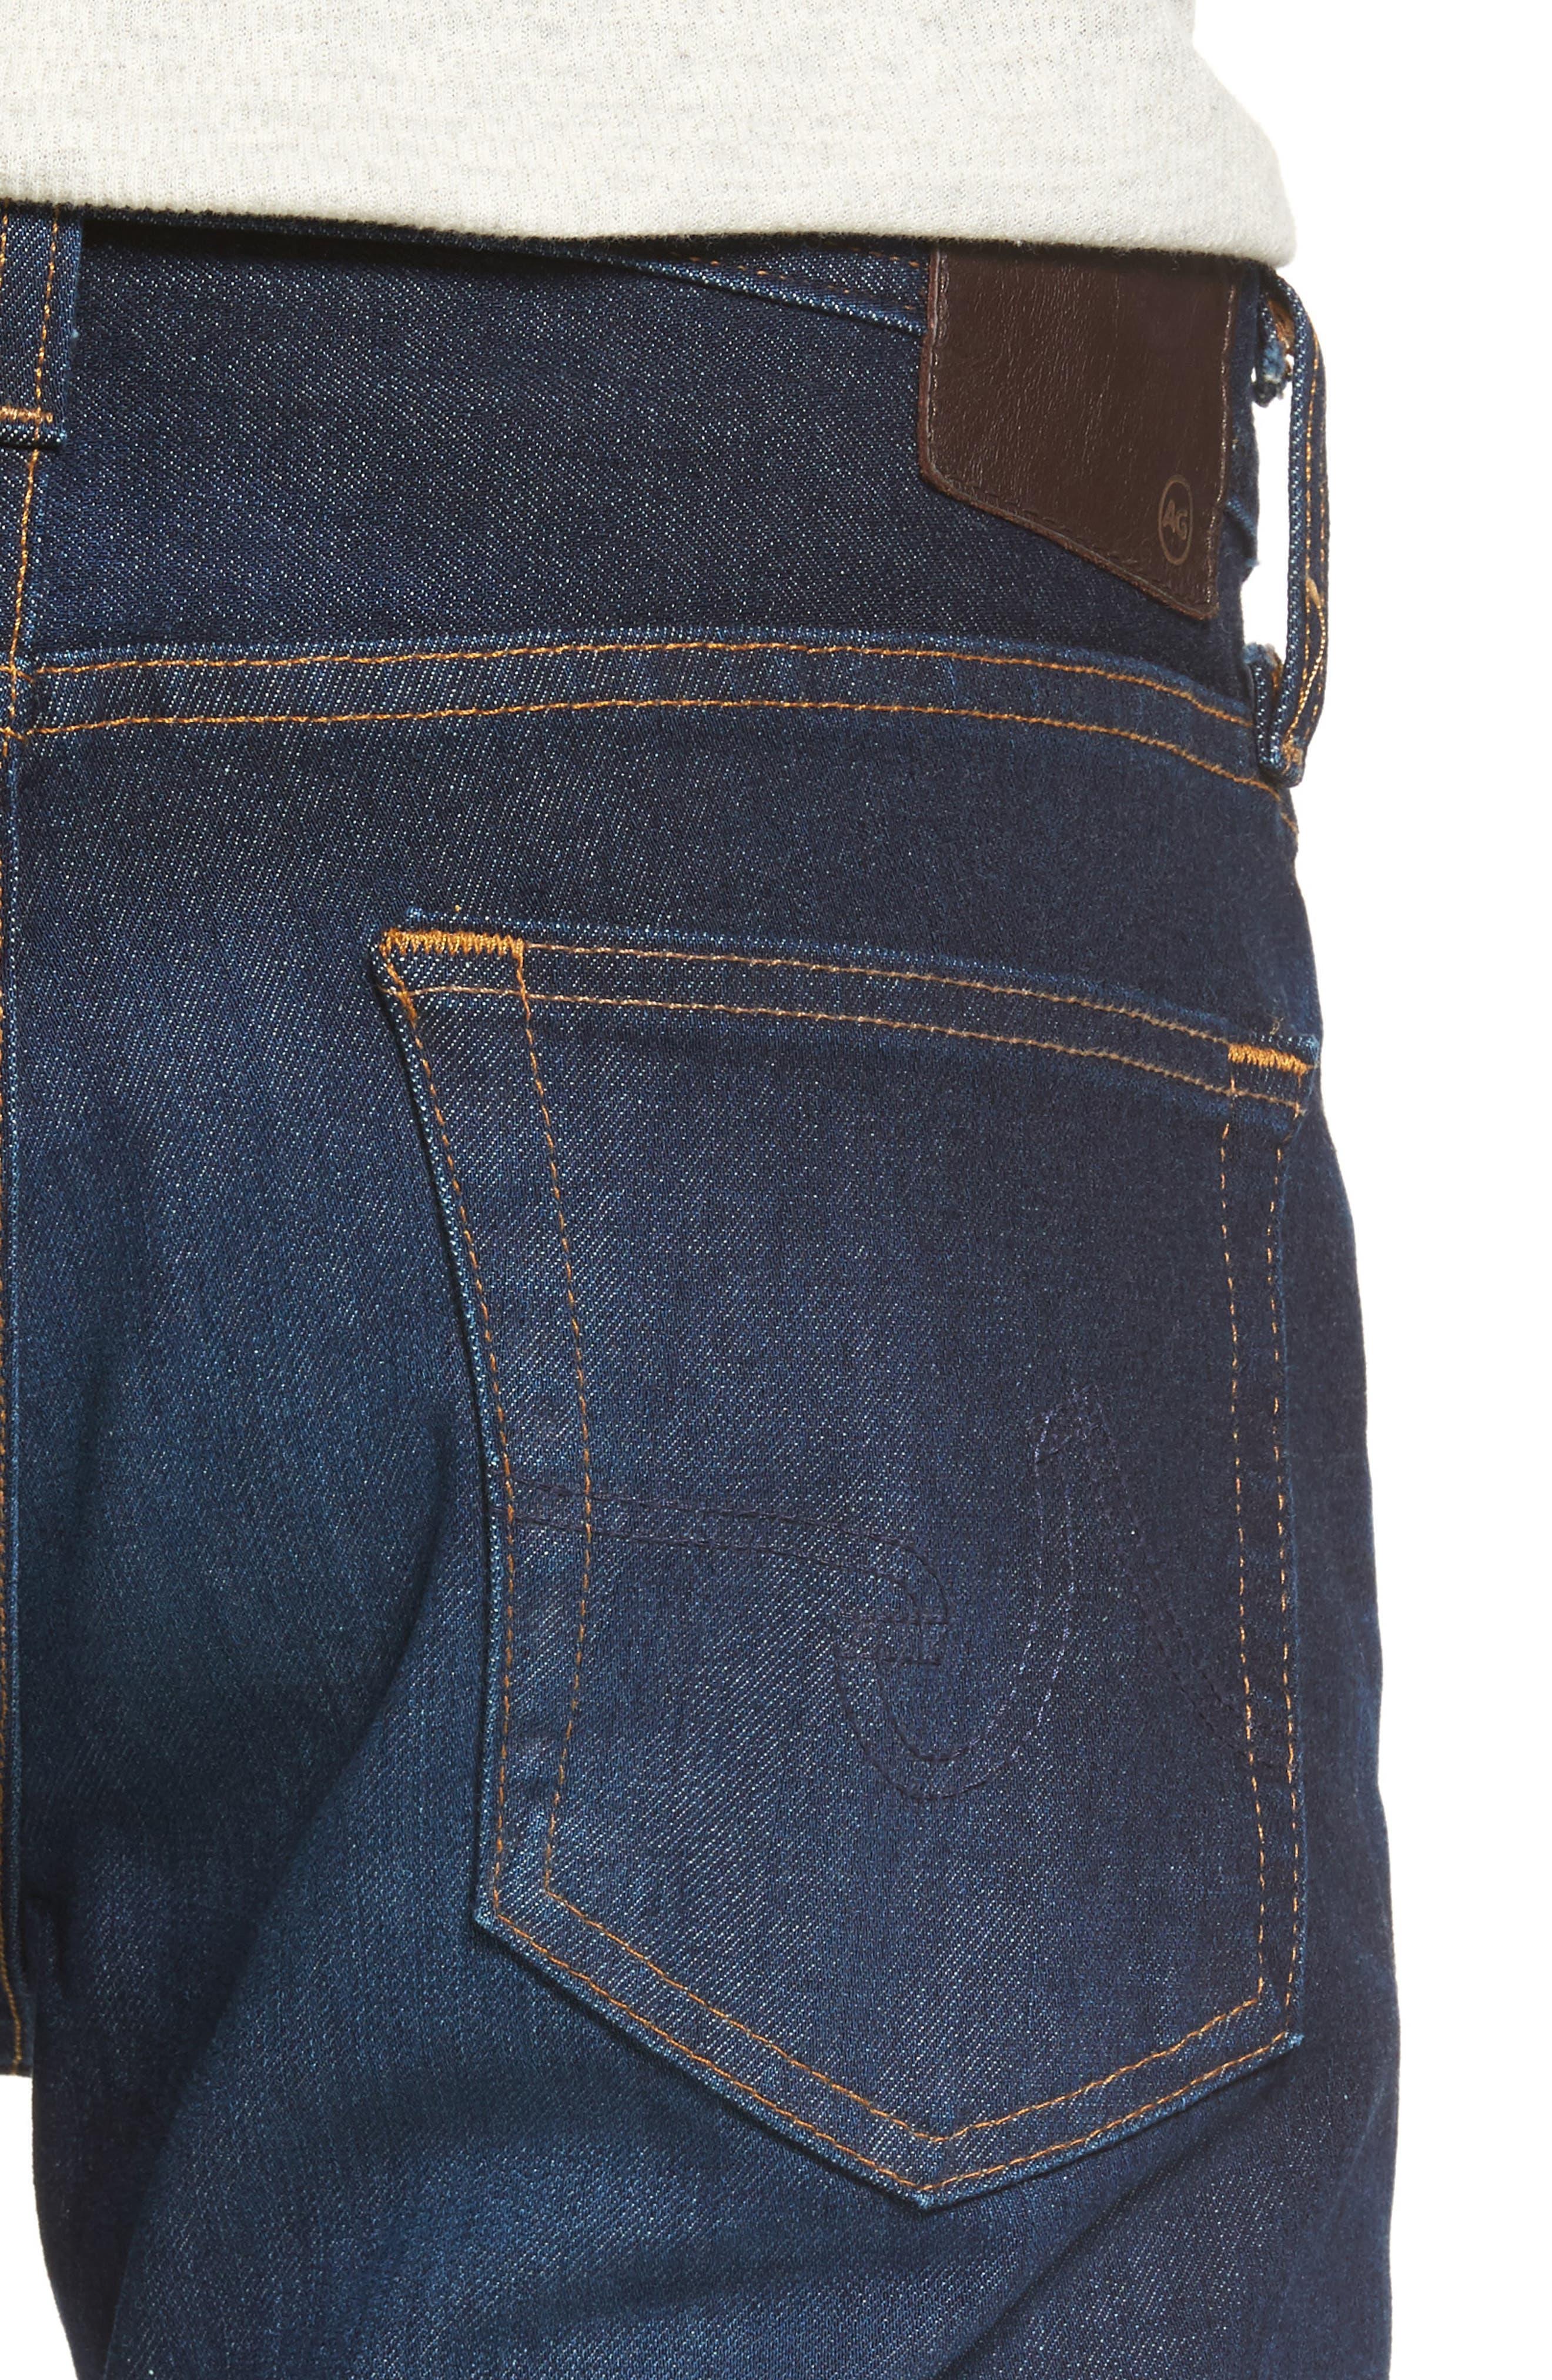 Dylan Skinny Jeans,                             Alternate thumbnail 4, color,                             5 Years Porter